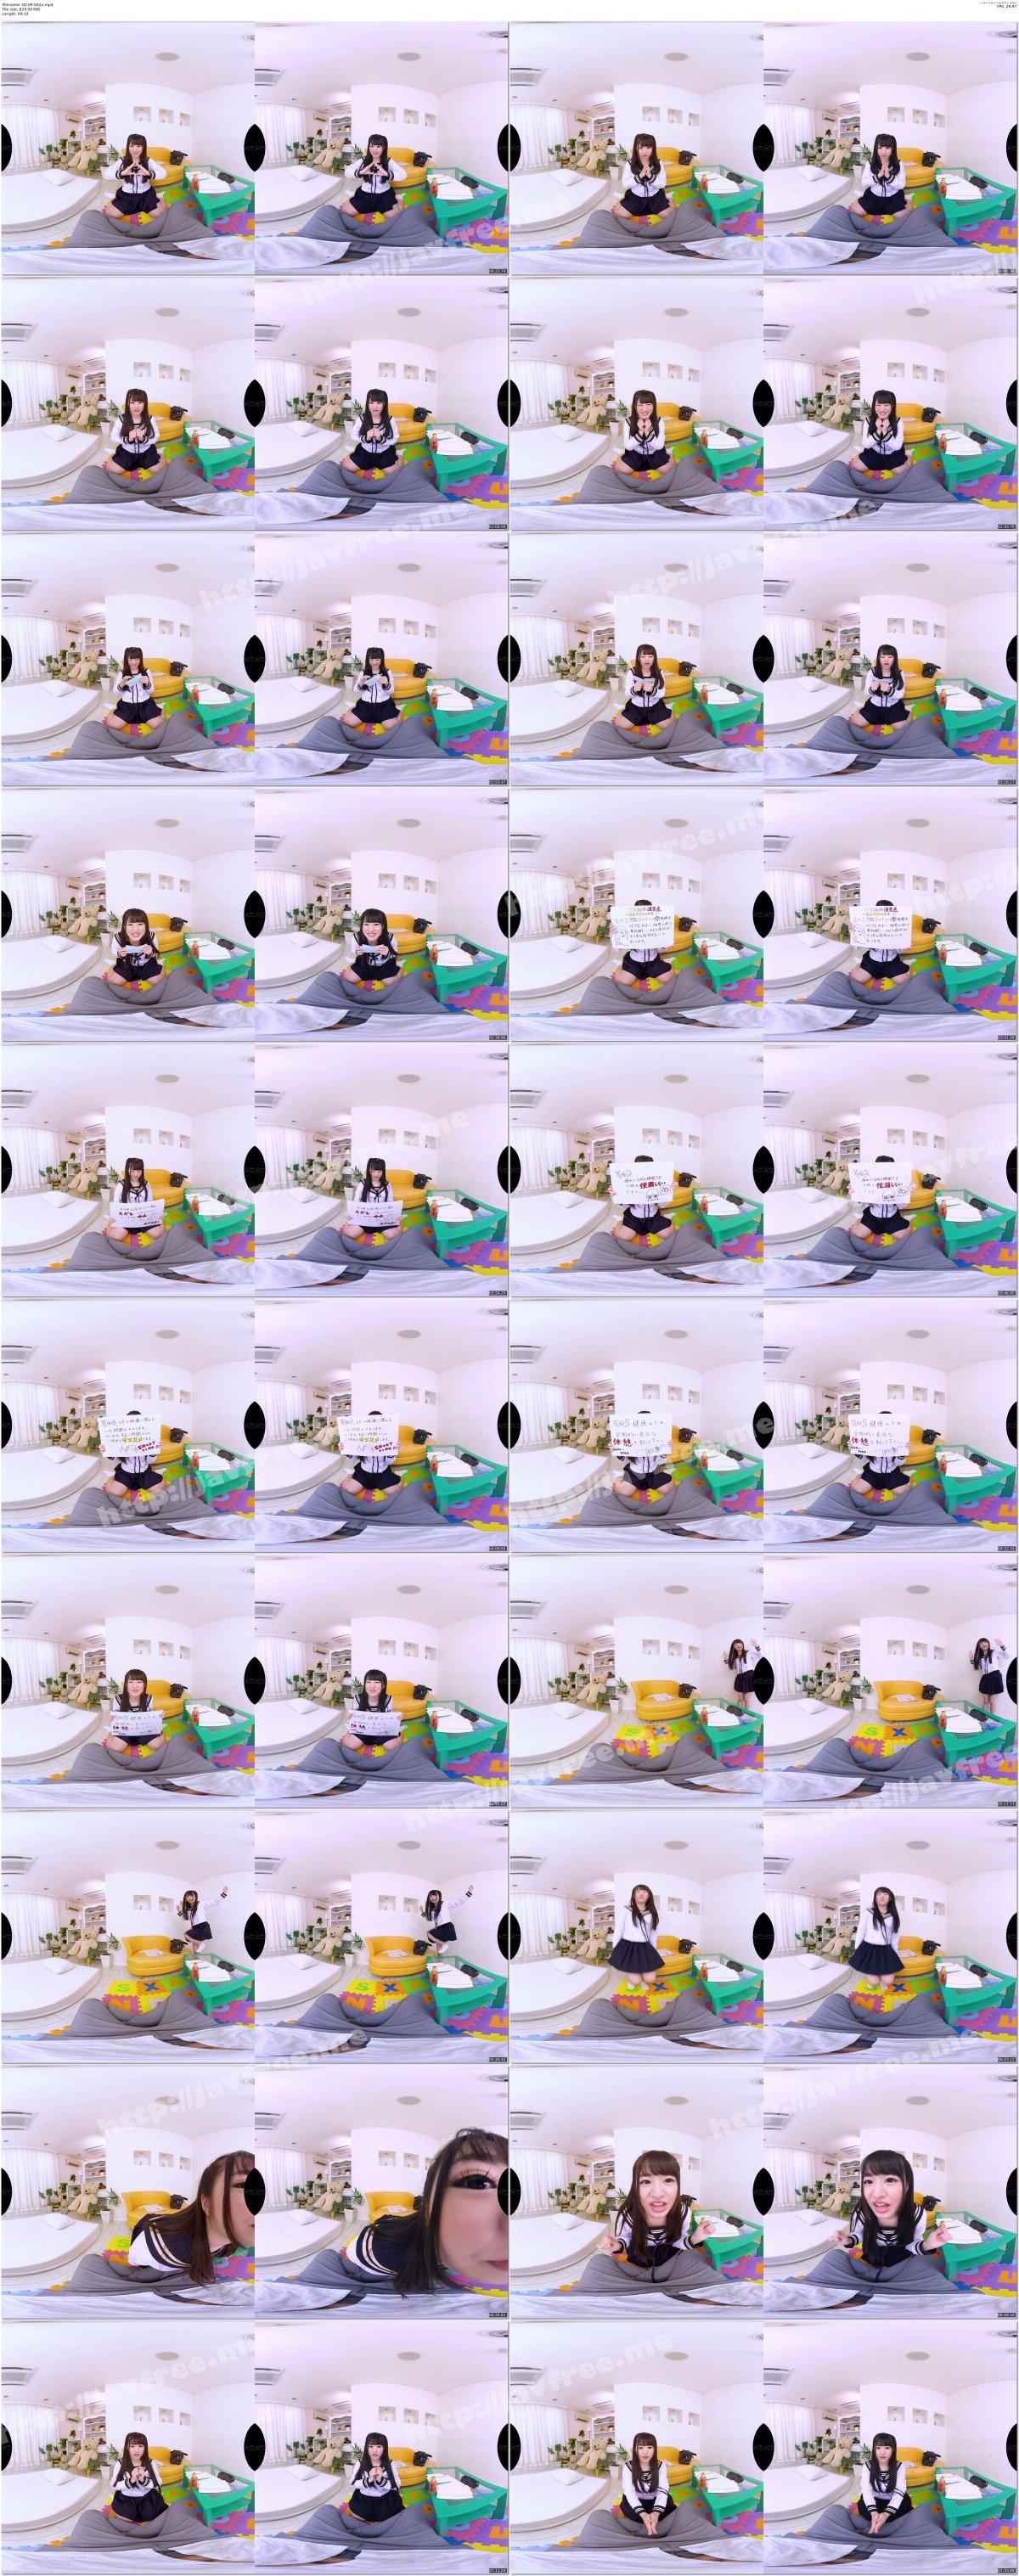 [OCVR-002] 【VR】3DVRからかい上手の可愛すぎる教え子に惚れ薬を飲ませたらアヘ顔全開イクイク!?大変なことになった件。桃尻かのん - image OCVR-002a on https://javfree.me